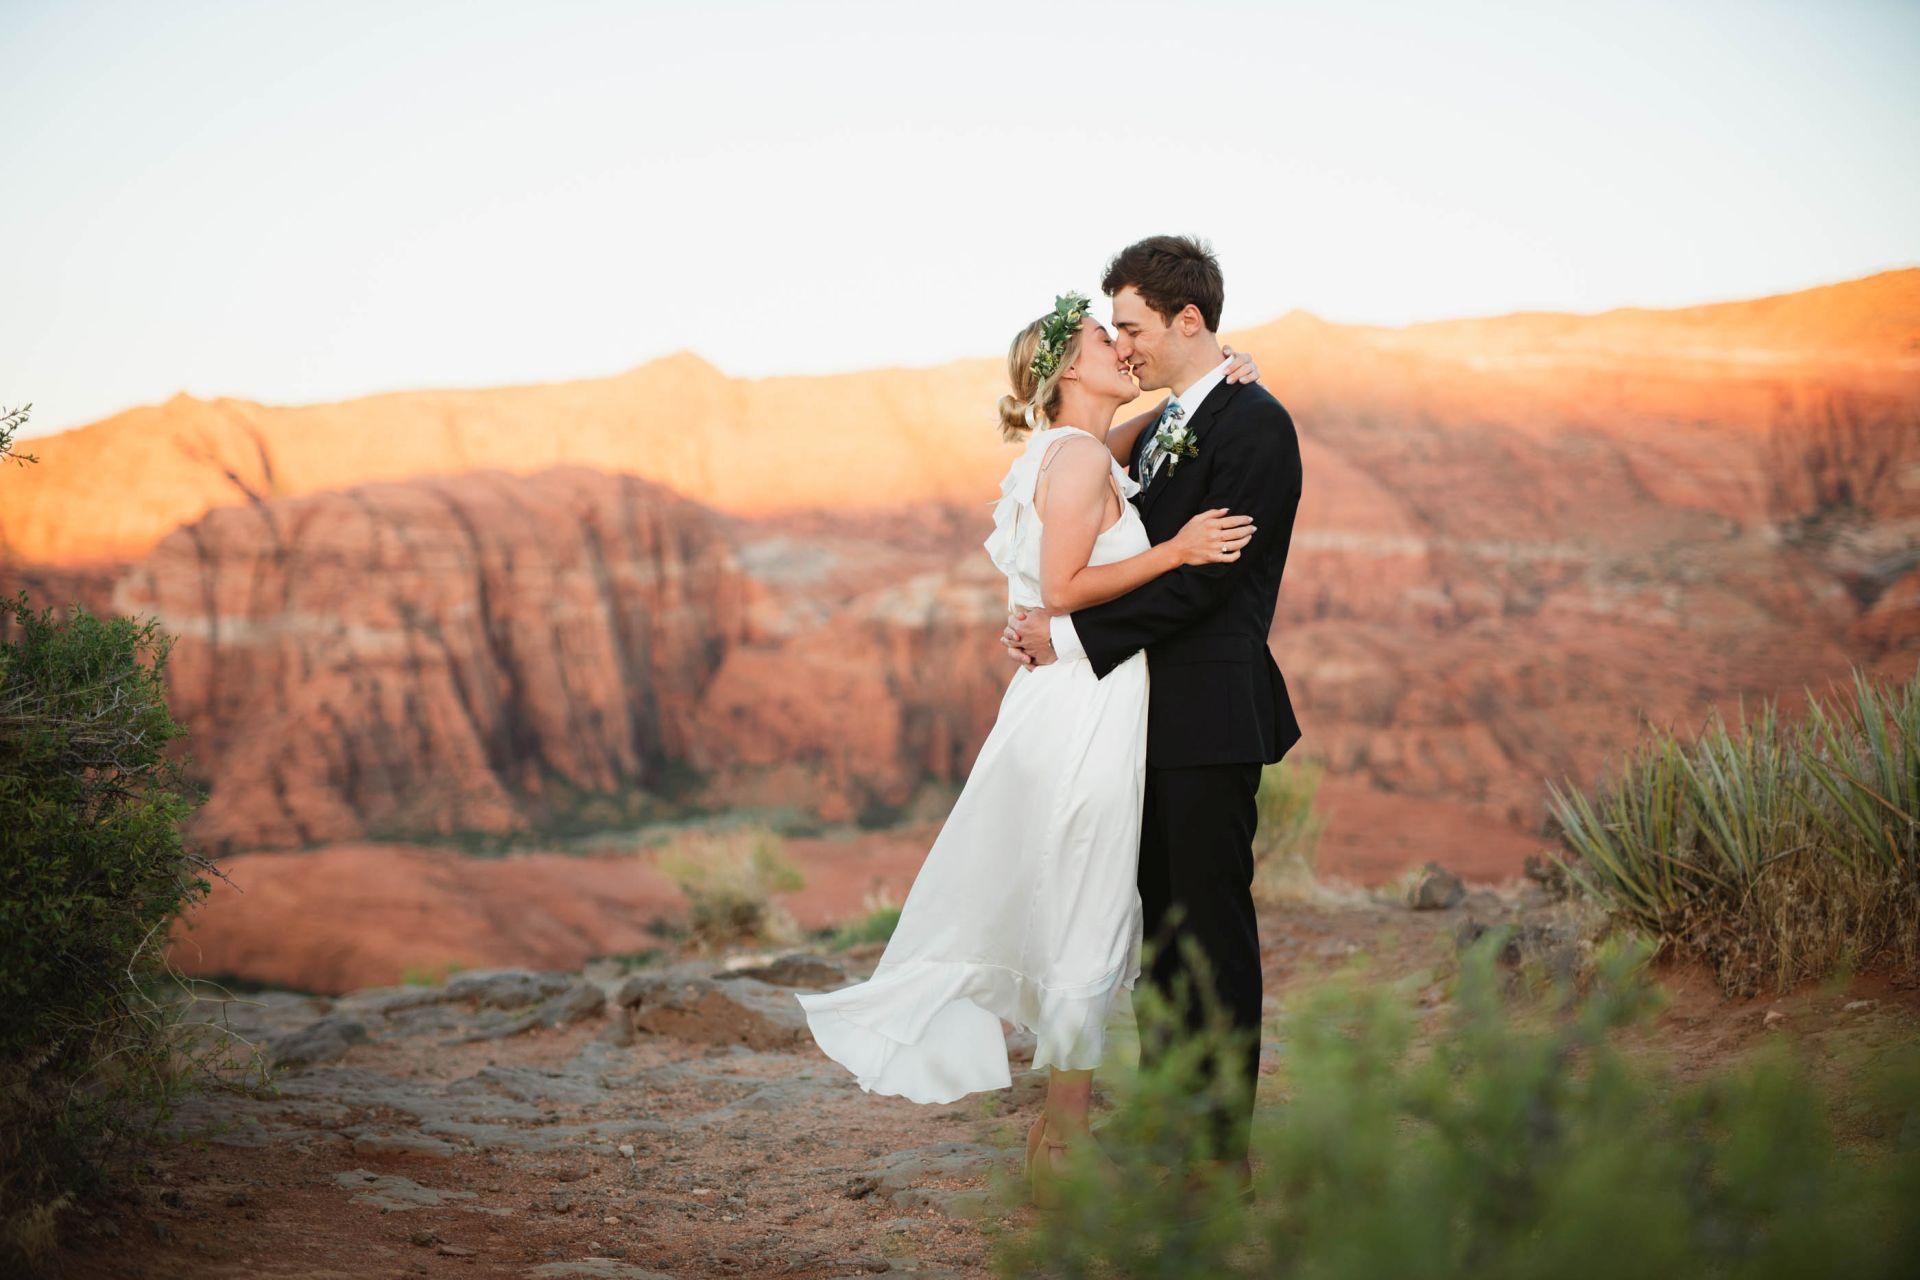 Hike Out wedding at Utah Desert - Bride and Groom kissing